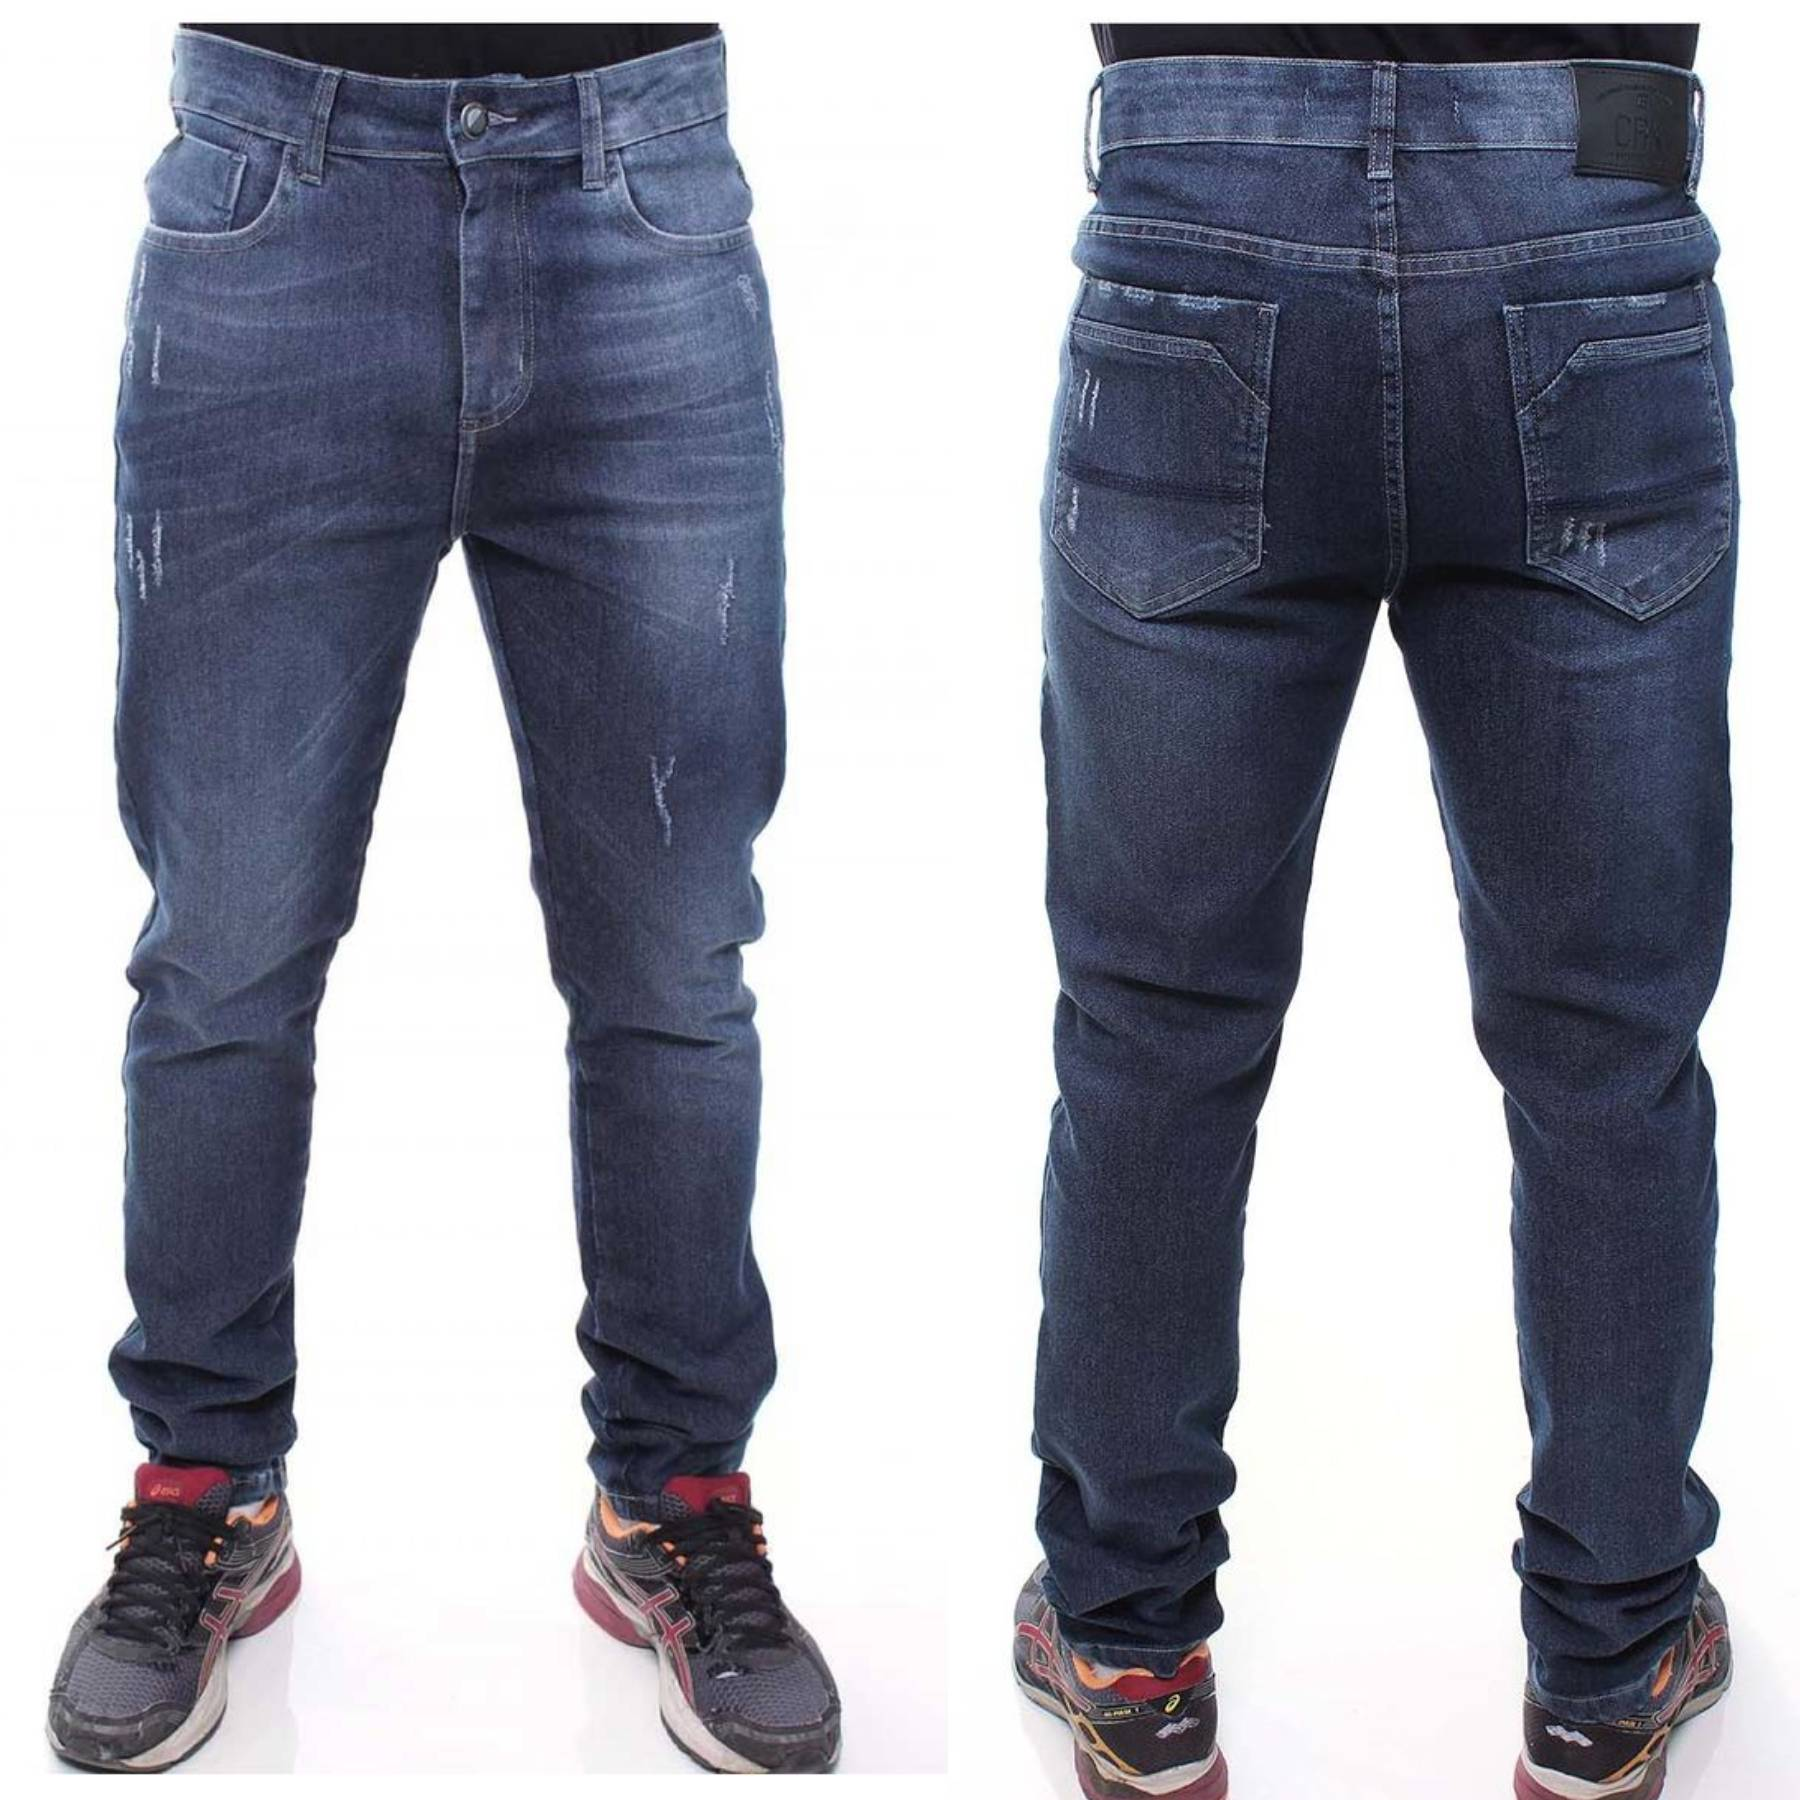 Calça Jeans Masculina Tradicional